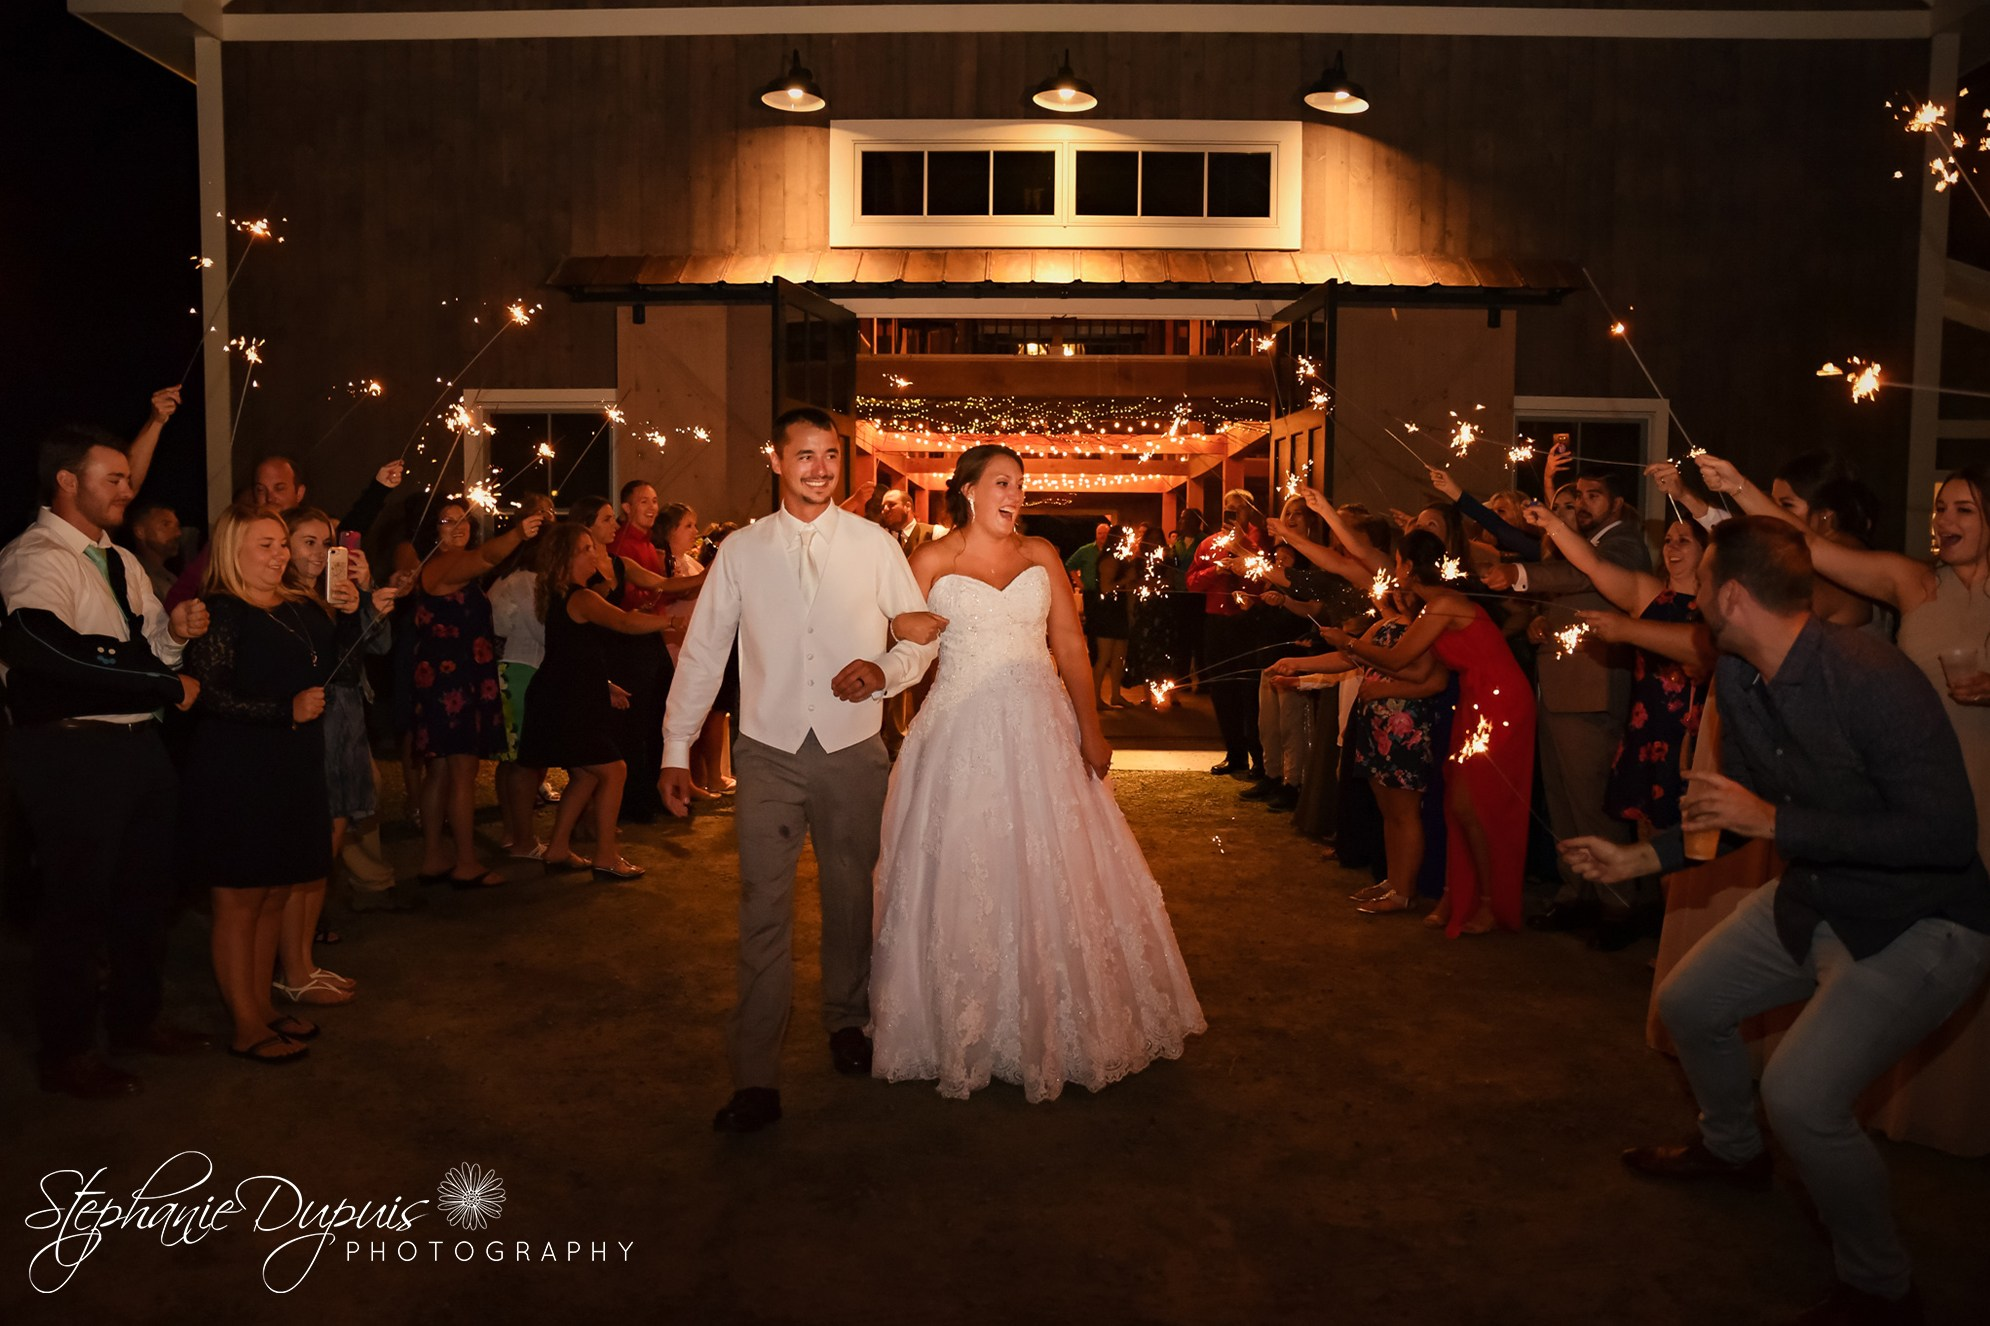 Whitefield Wedding Photographer 07 1 - Portfolio: Nason Wedding